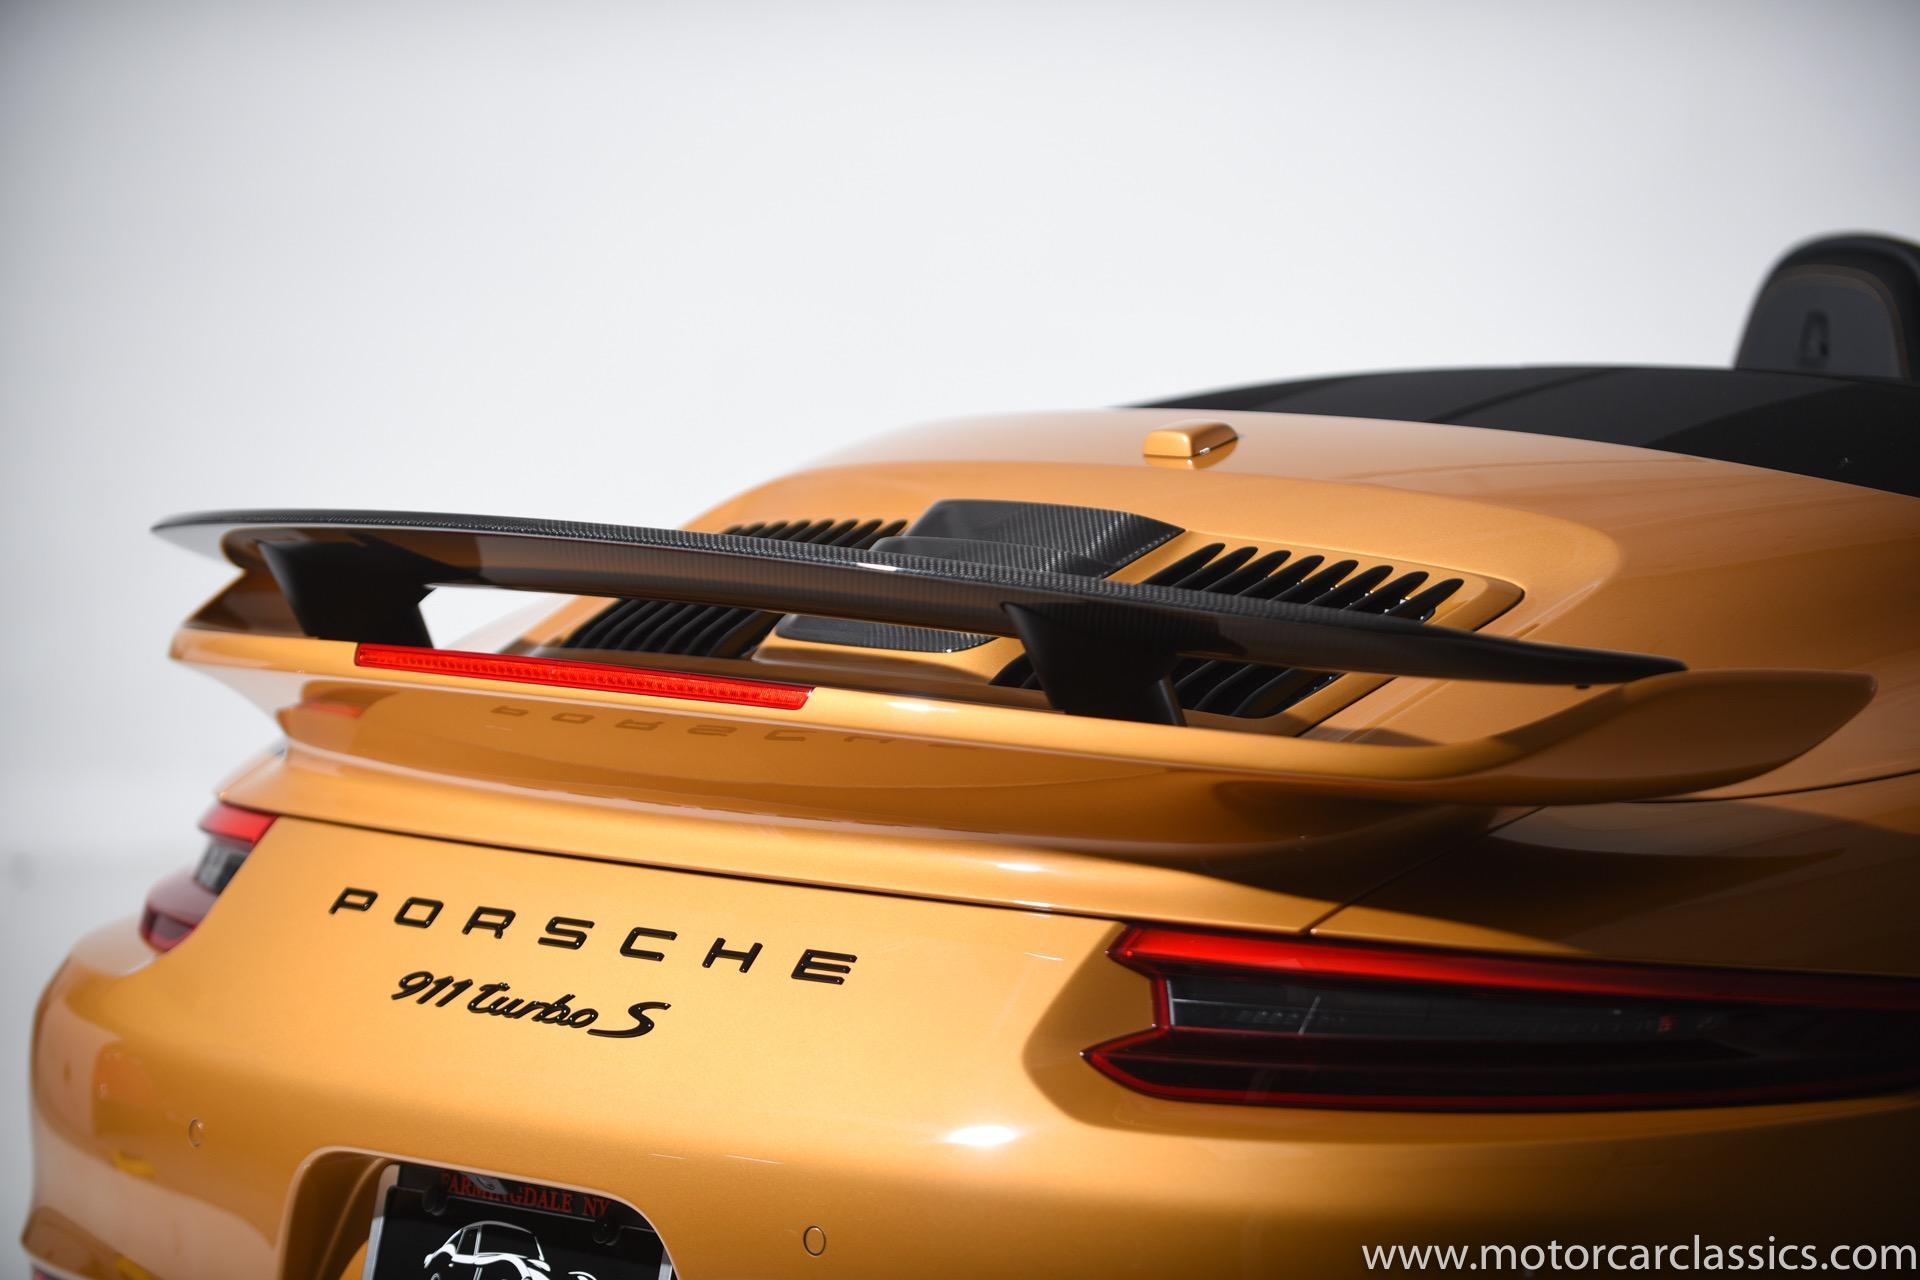 2019 Porsche 911 Turbo S Exclusive